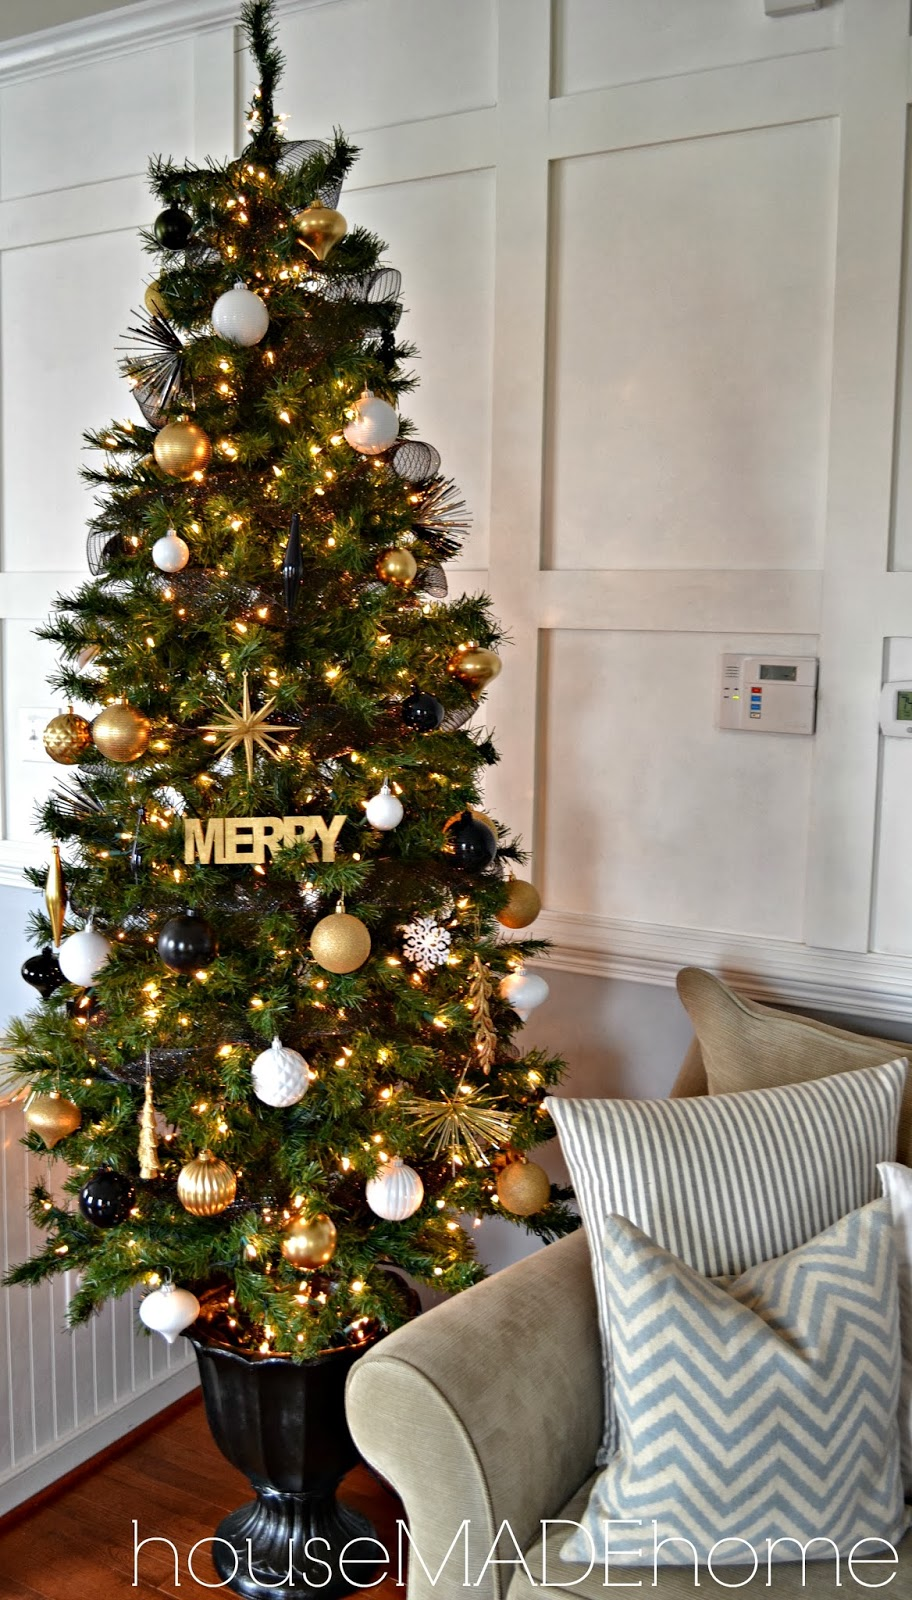 Jasmine Terrace: HMH Designs: A Modern Glam Christmas Home Tour